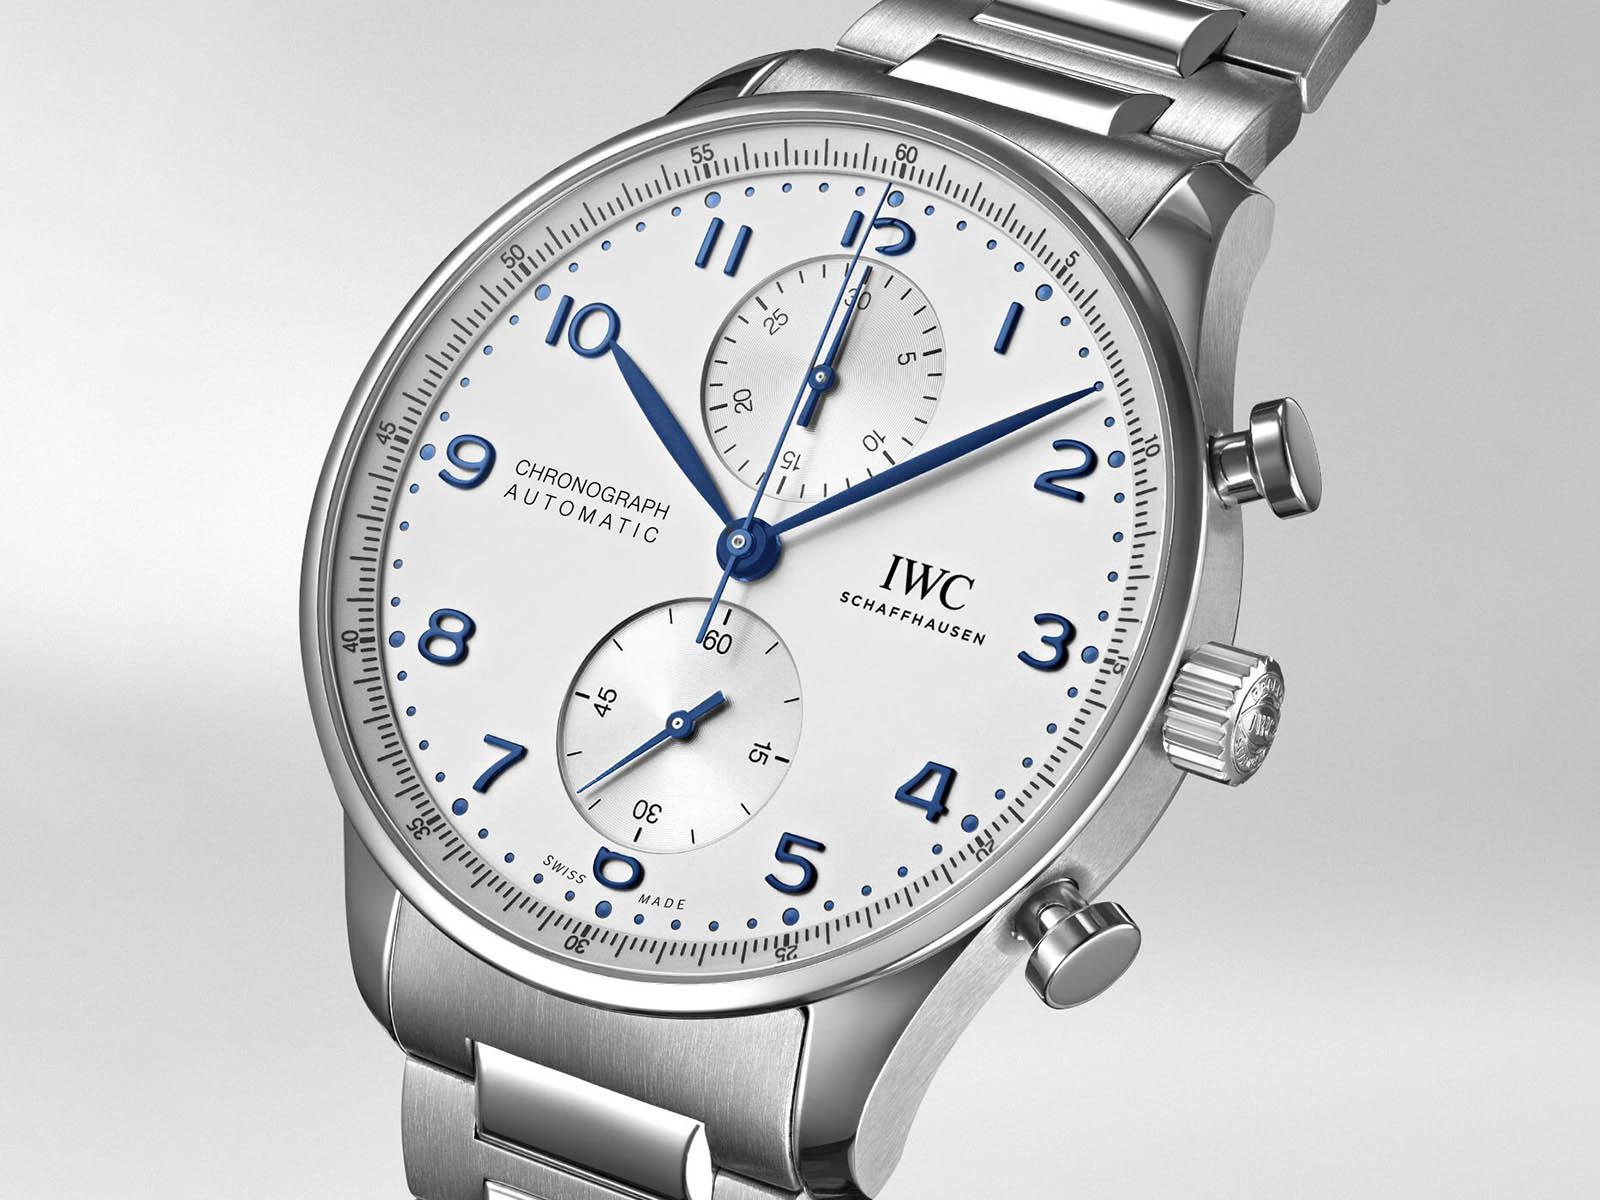 iw371617-iwc-portugieser-chronograph-stainless-steel-bracelet-3.jpg